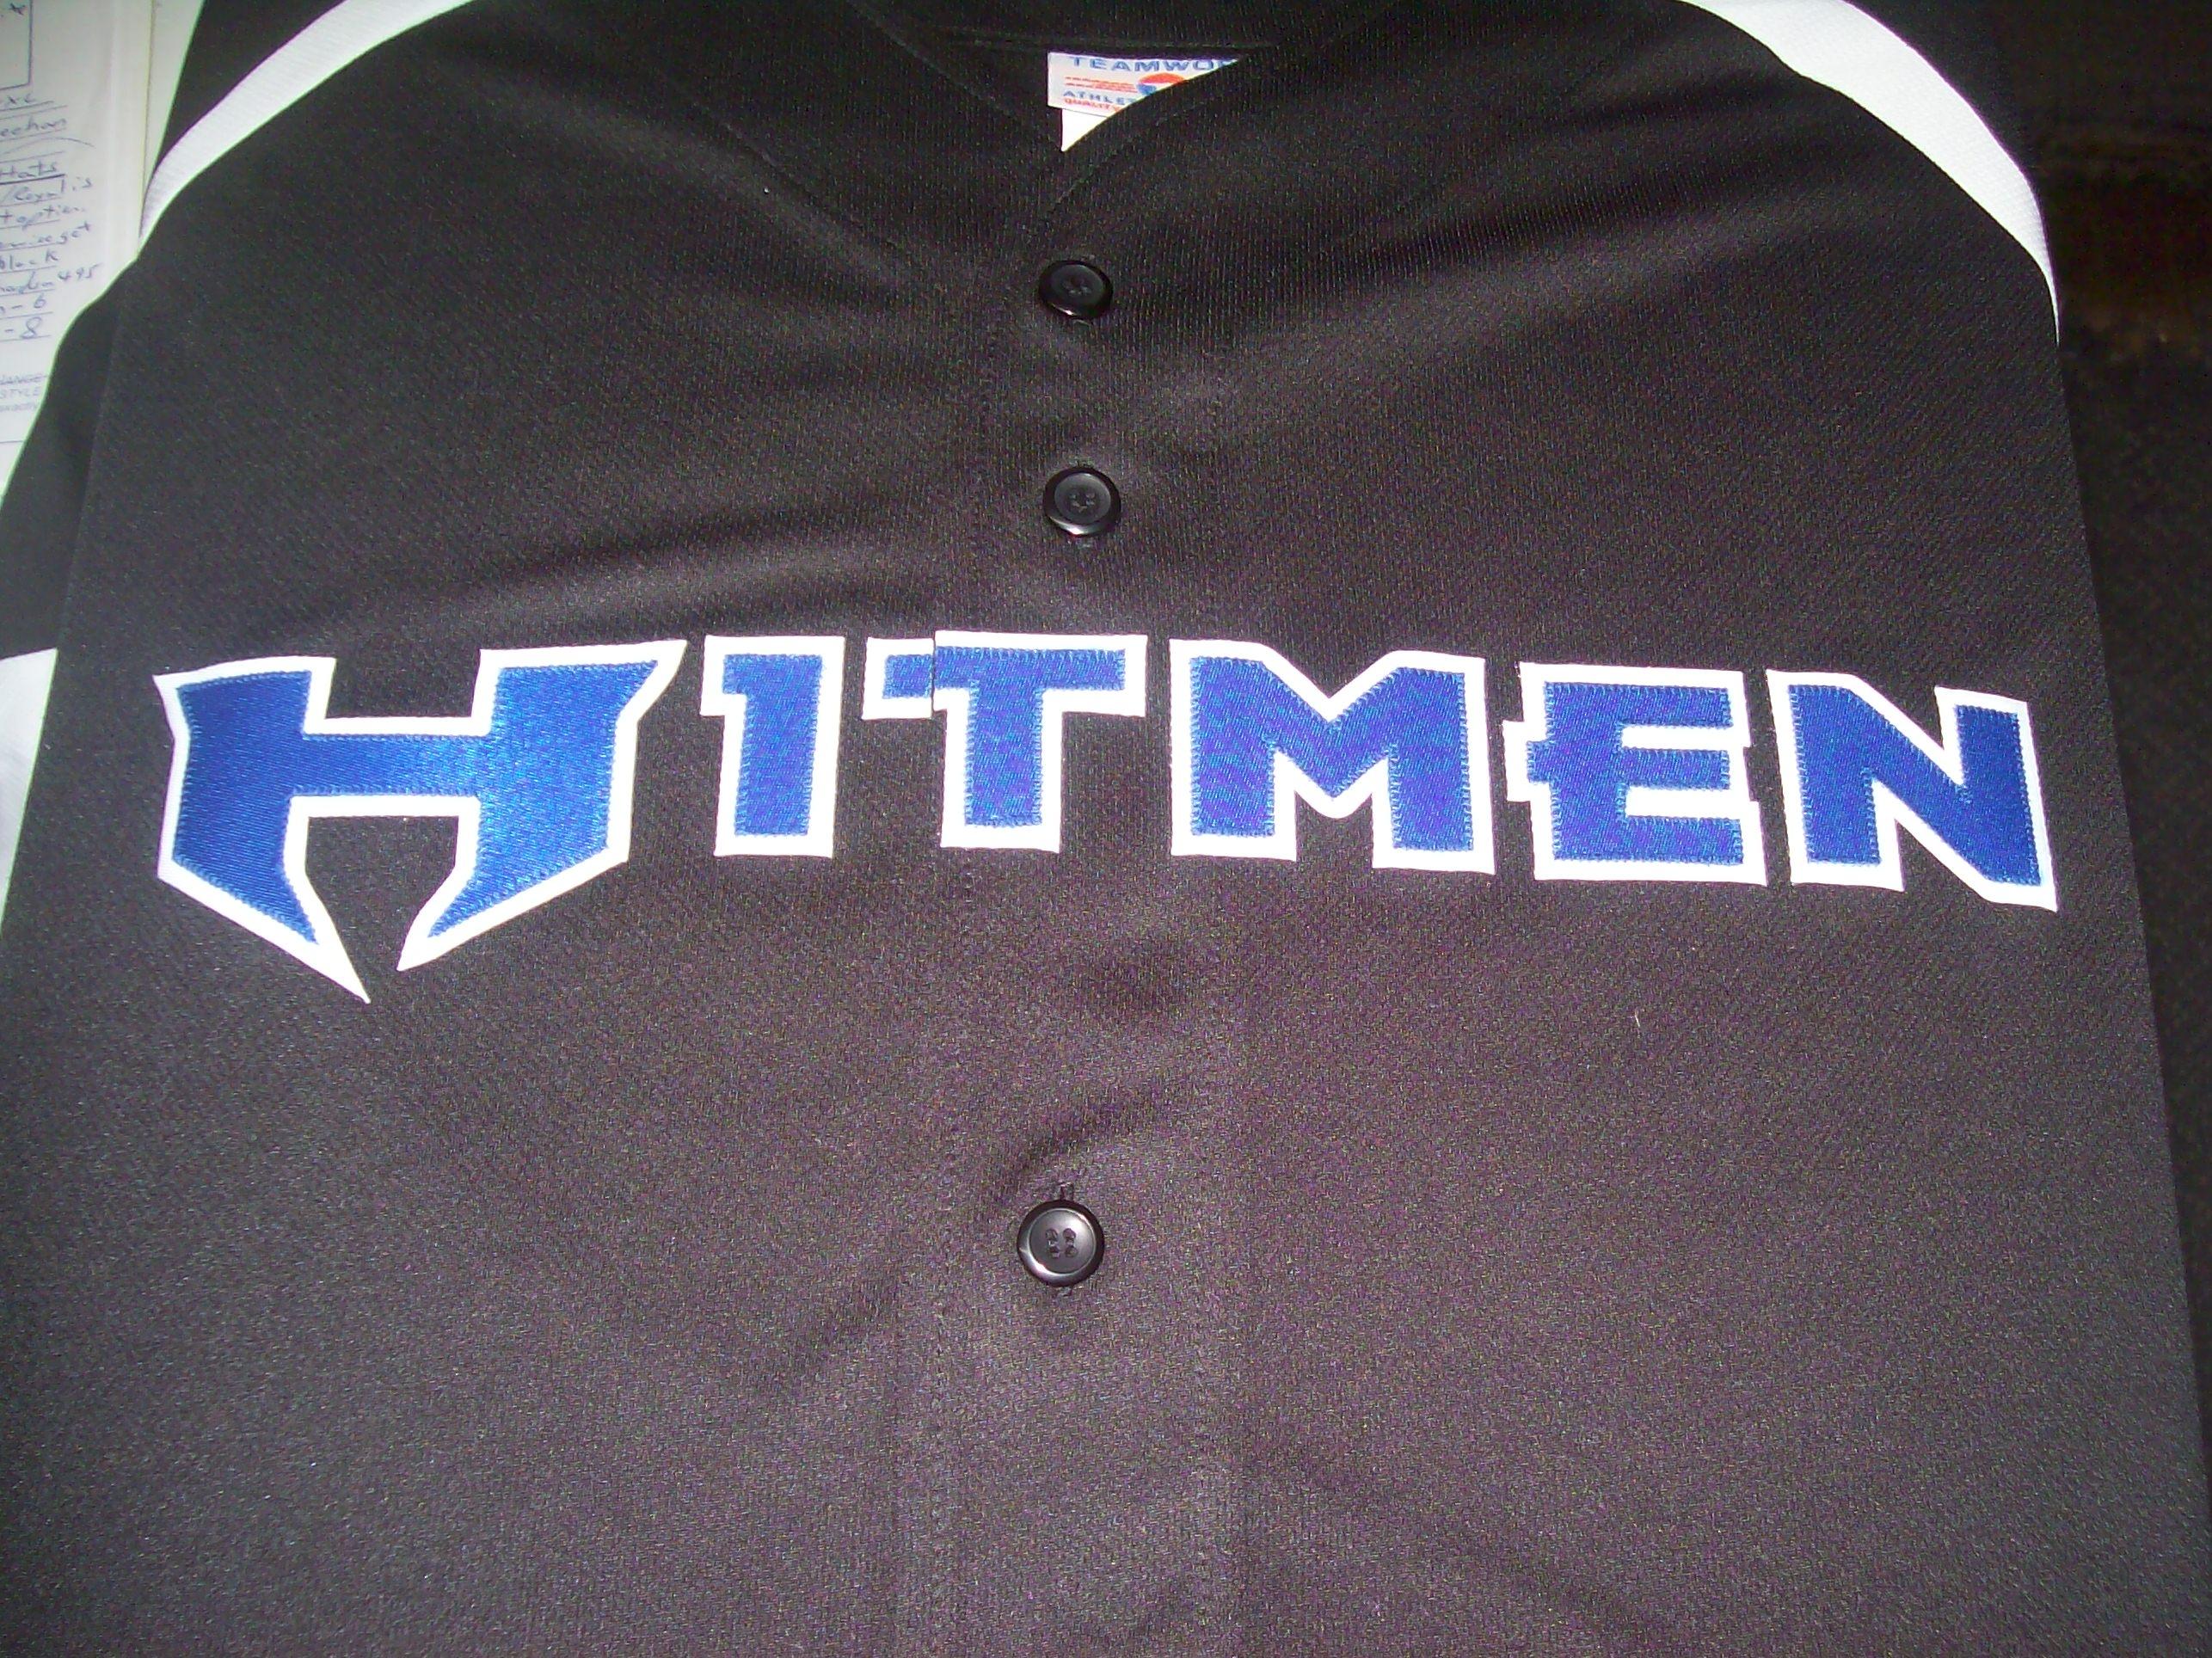 Hitmen_Front